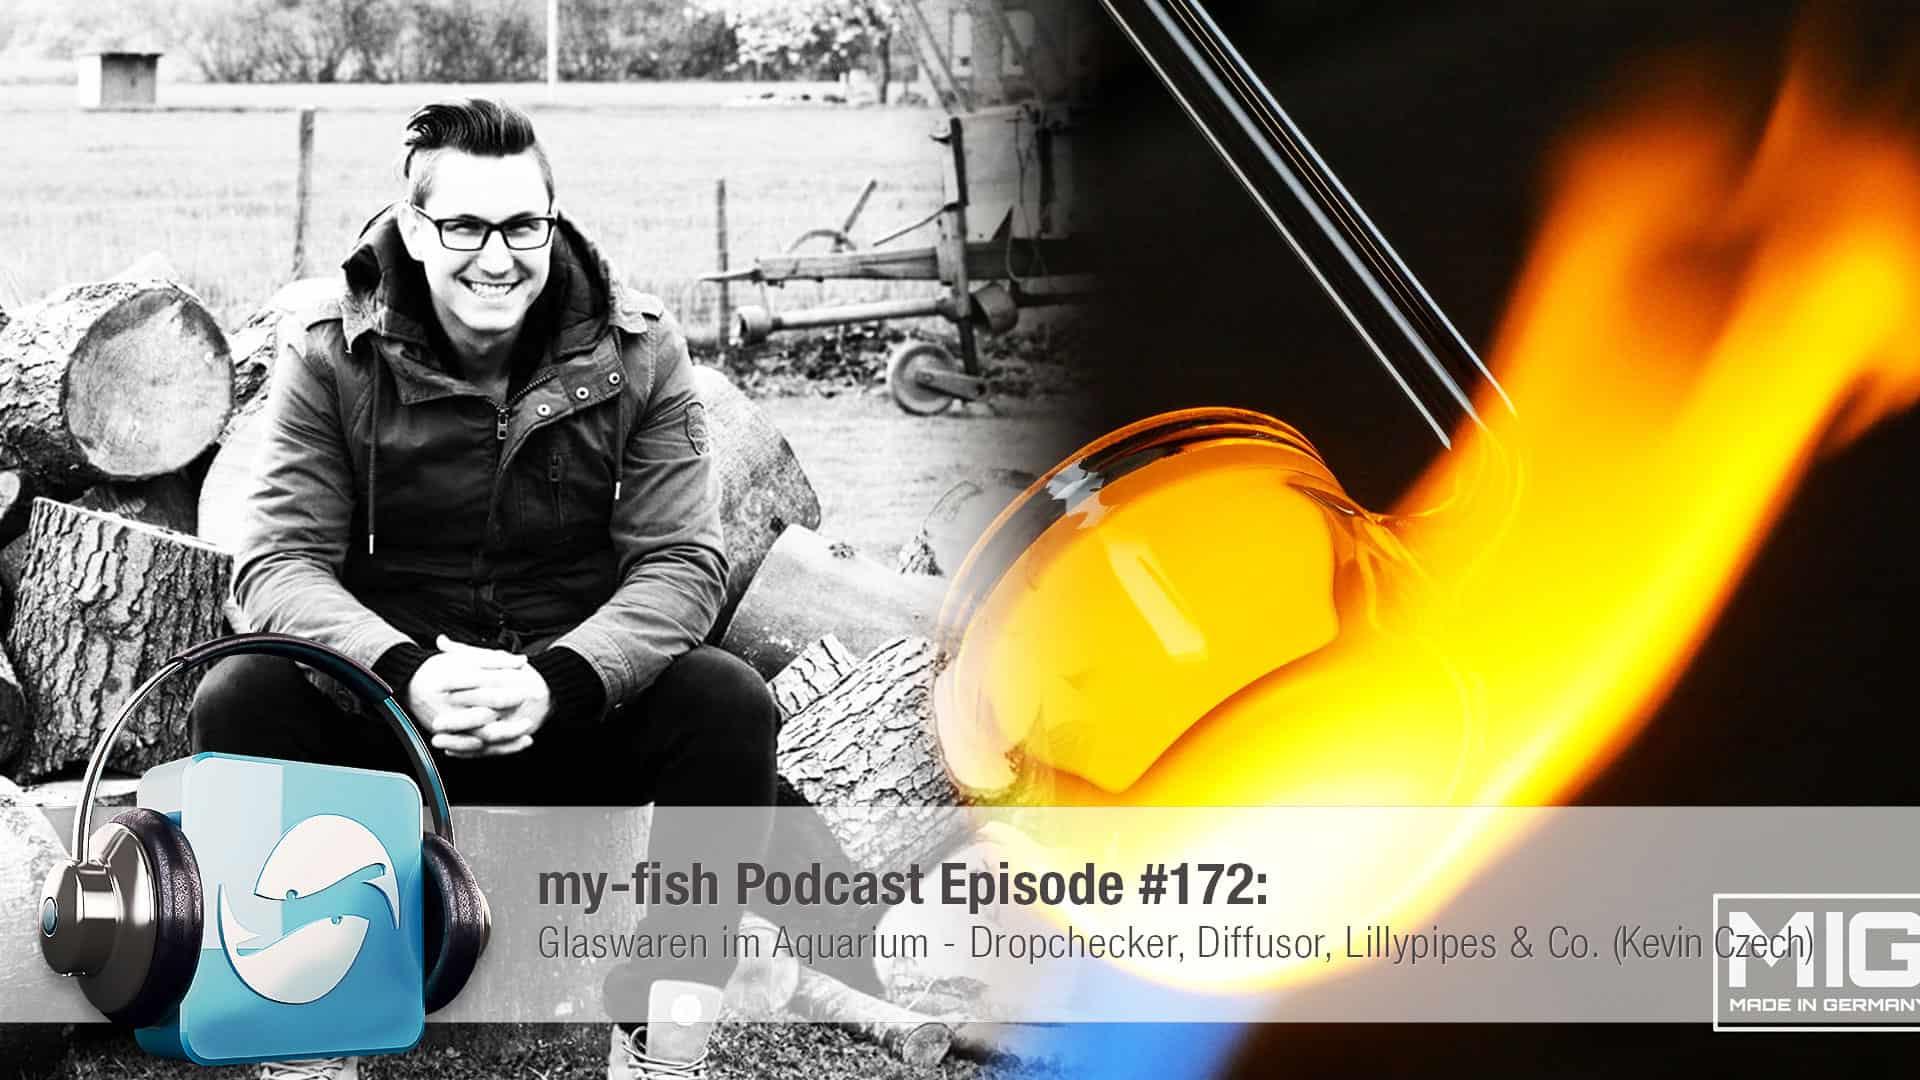 Podcast Episode #172: Glaswaren im Aquarium - Dropchecker, Diffusor, Lillypipes & Co. (Kevin Czech) 1